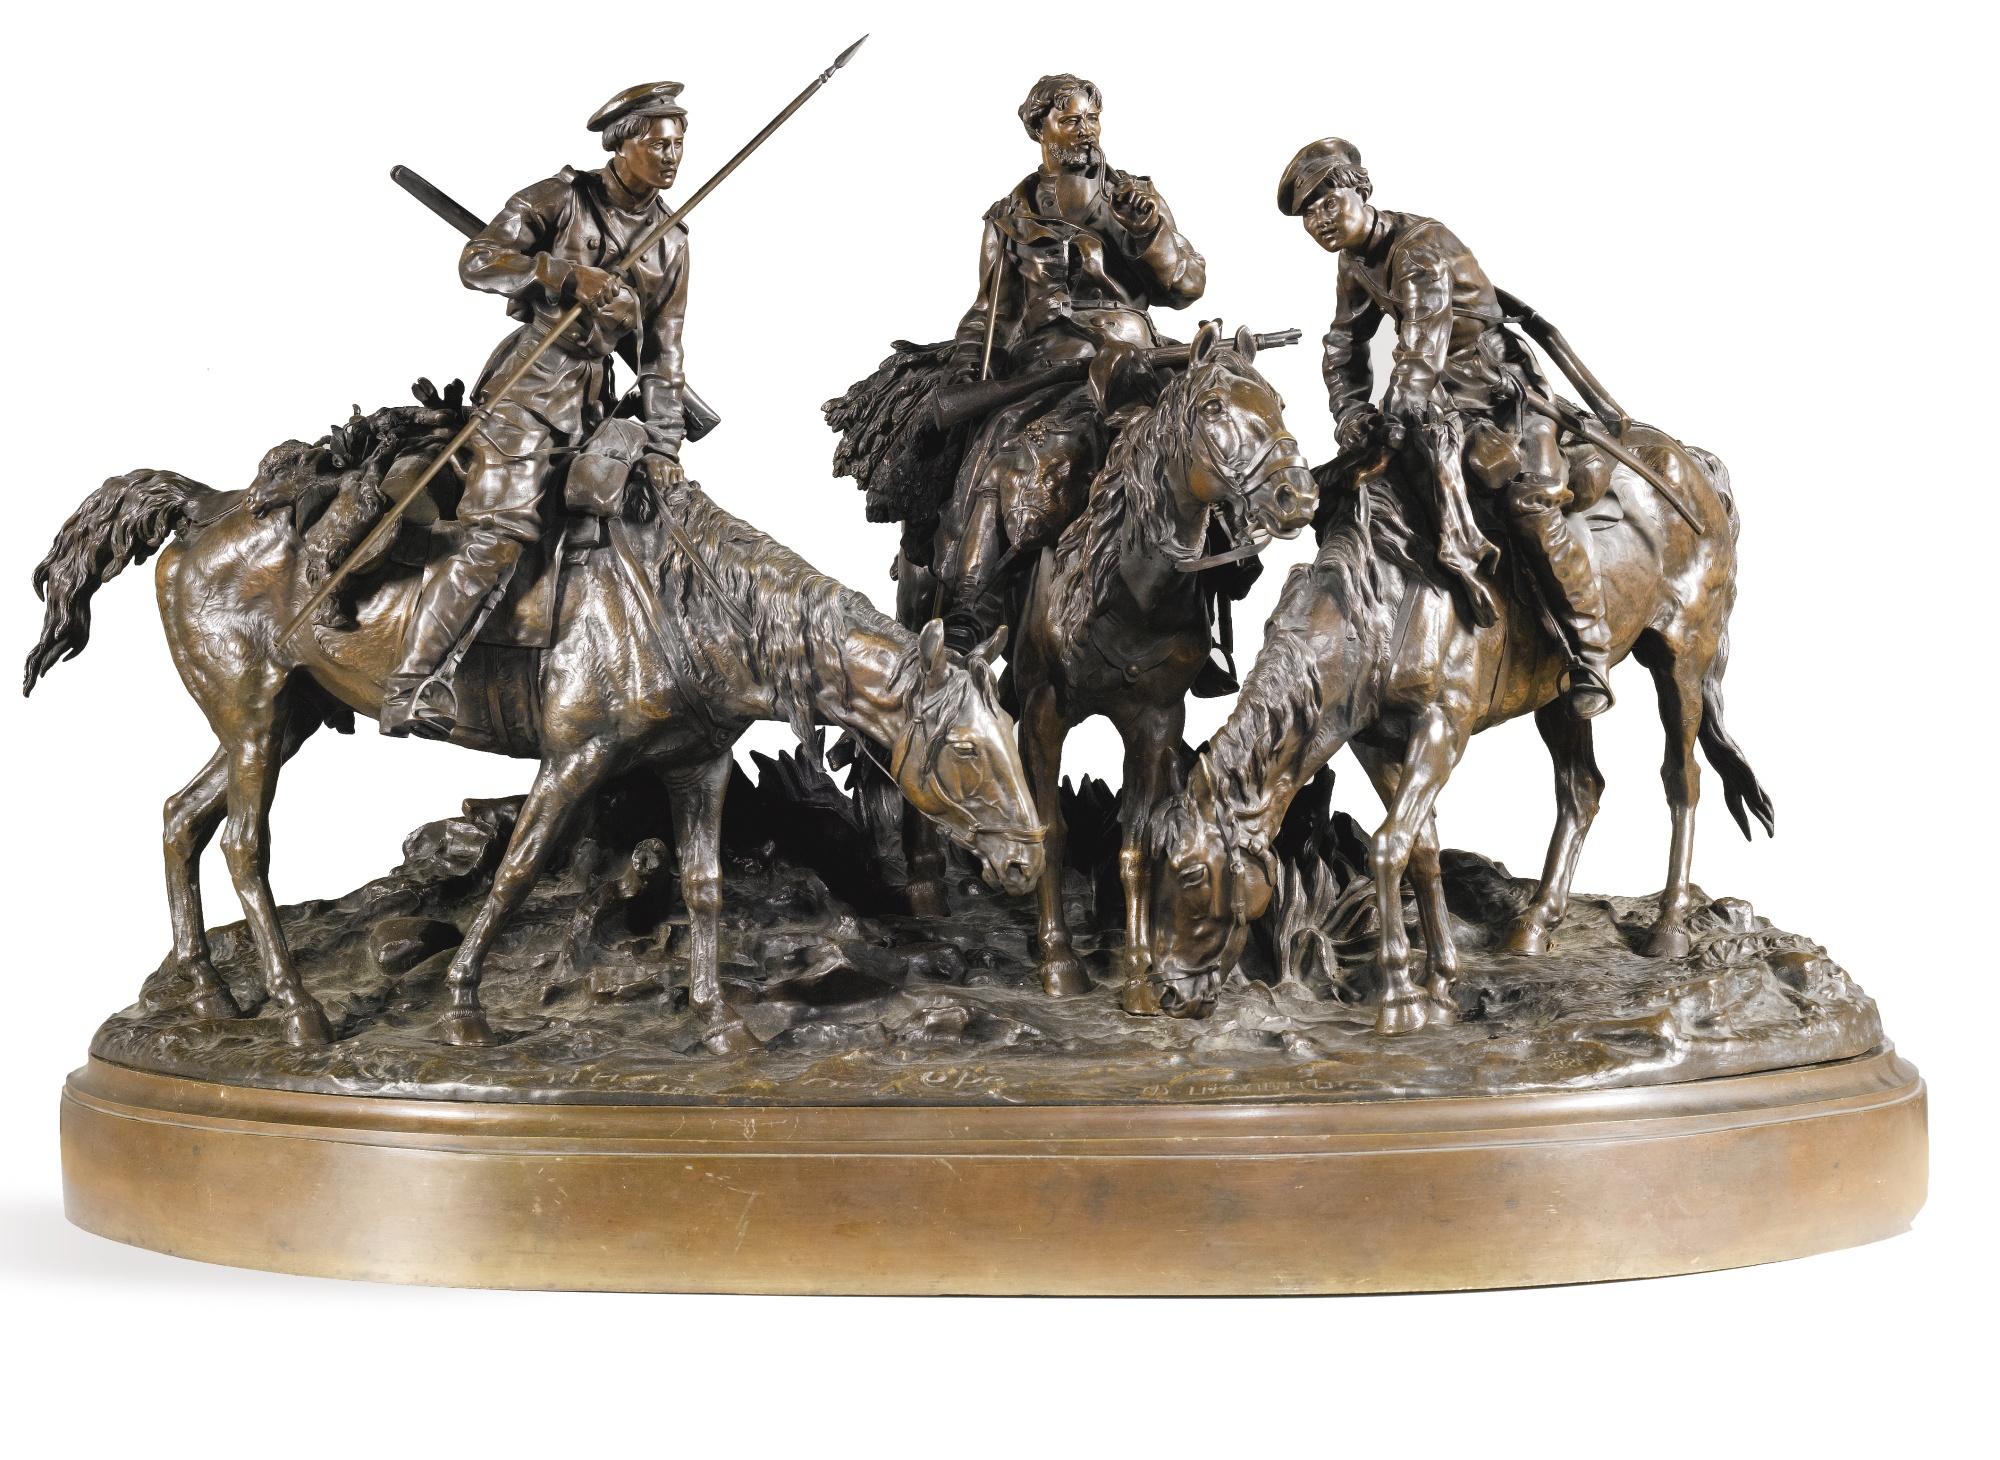 Фуражиры казаки лансере бронза - Lanceray-bronze-russian-three-cossacks-horseback-water-foundry